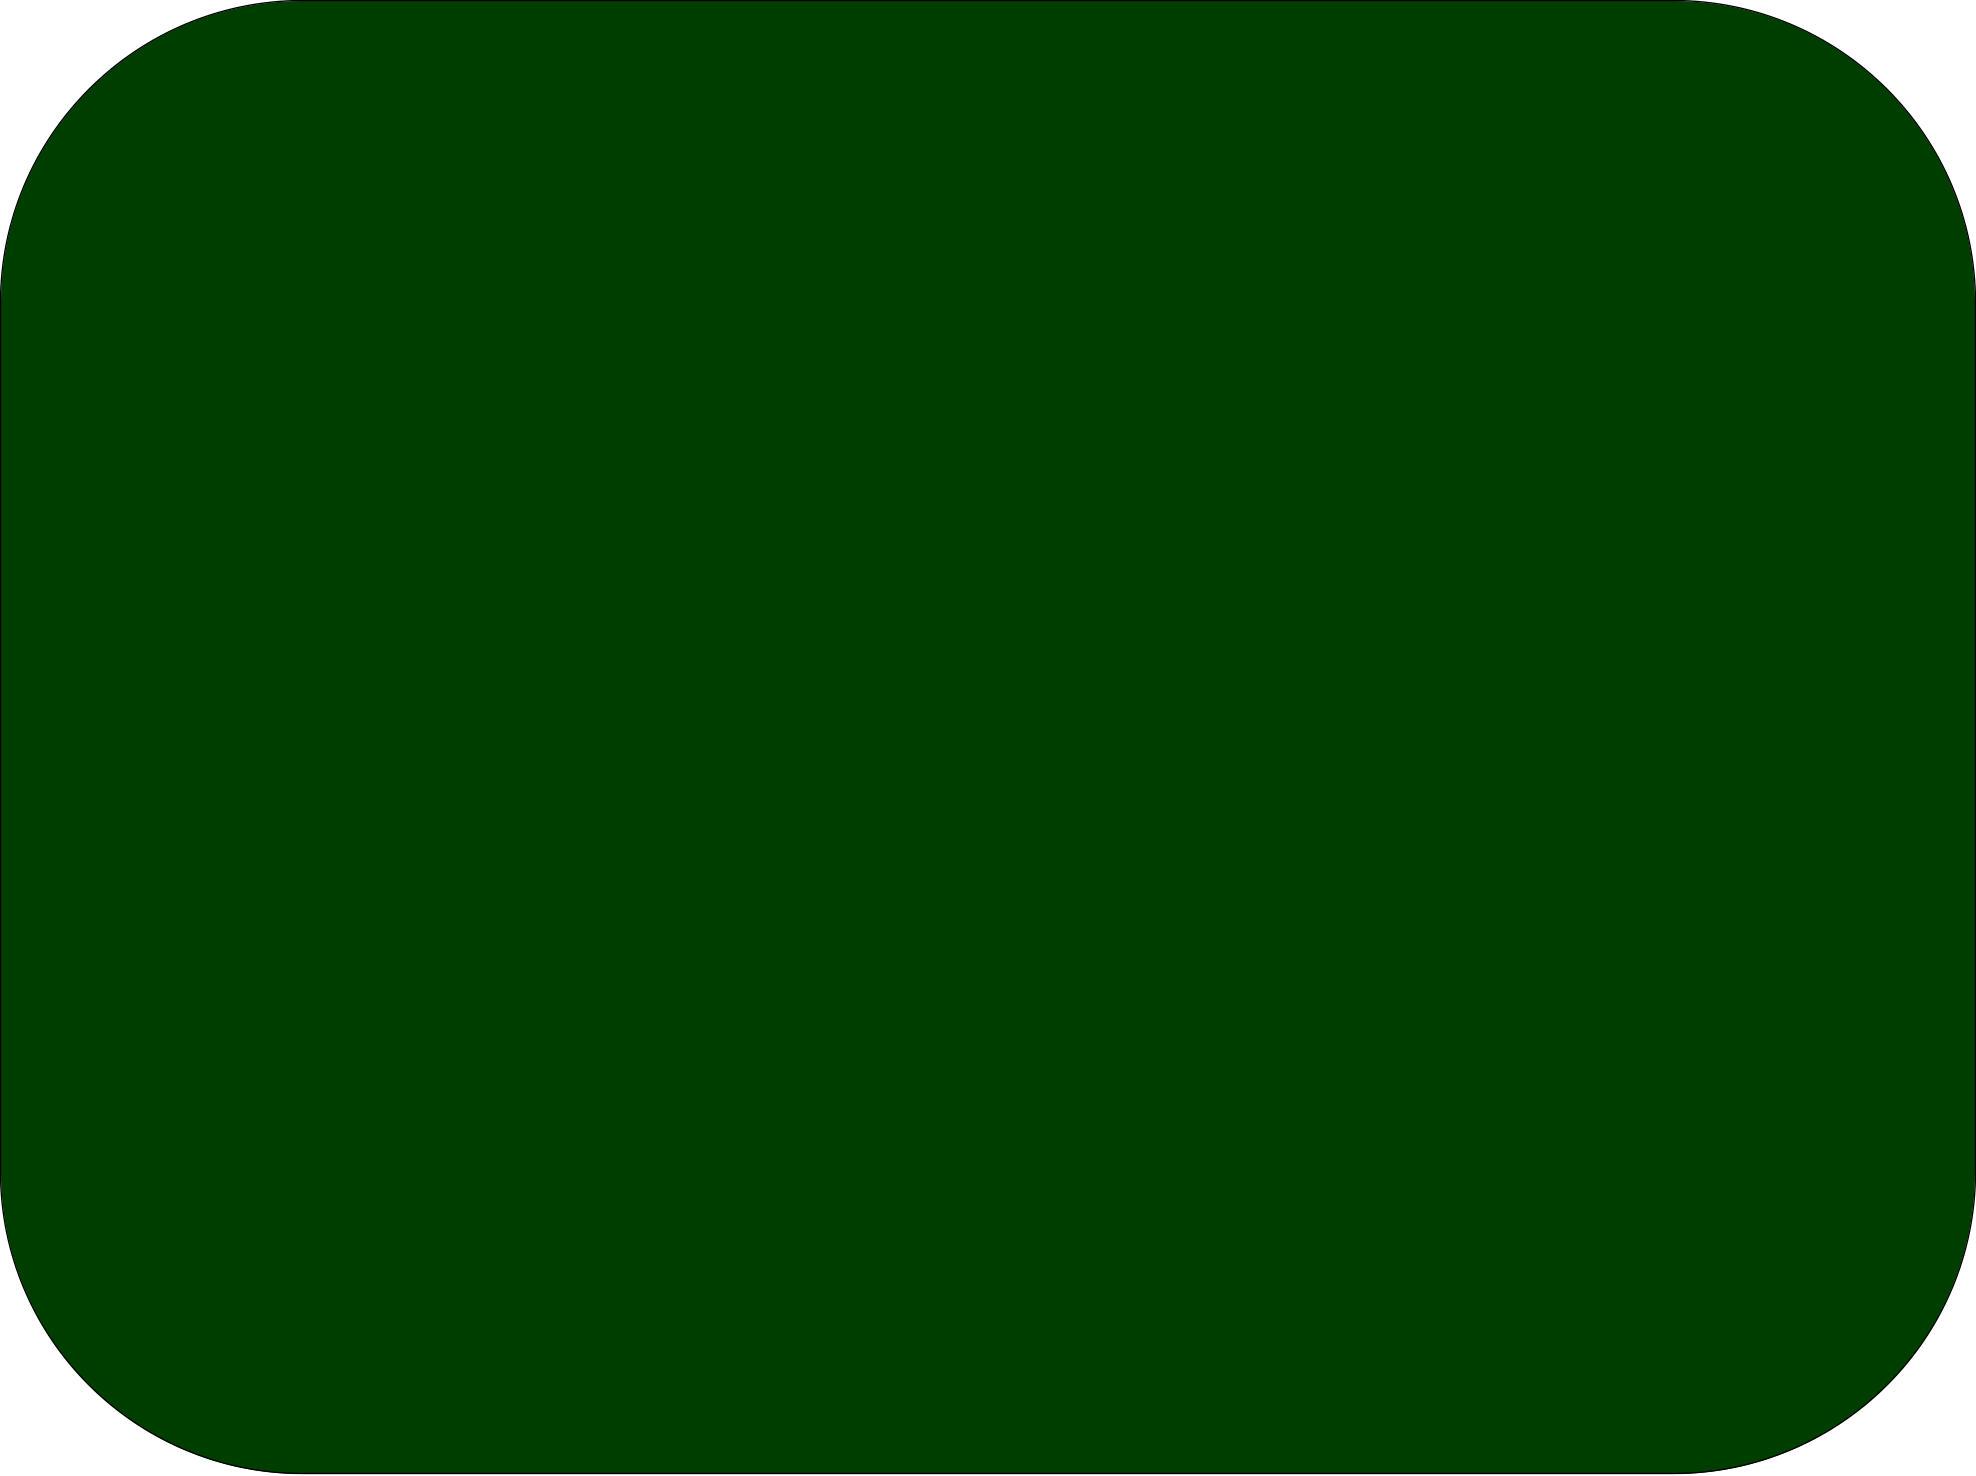 Marshmallow Fondant Flavor Emerald Green Color